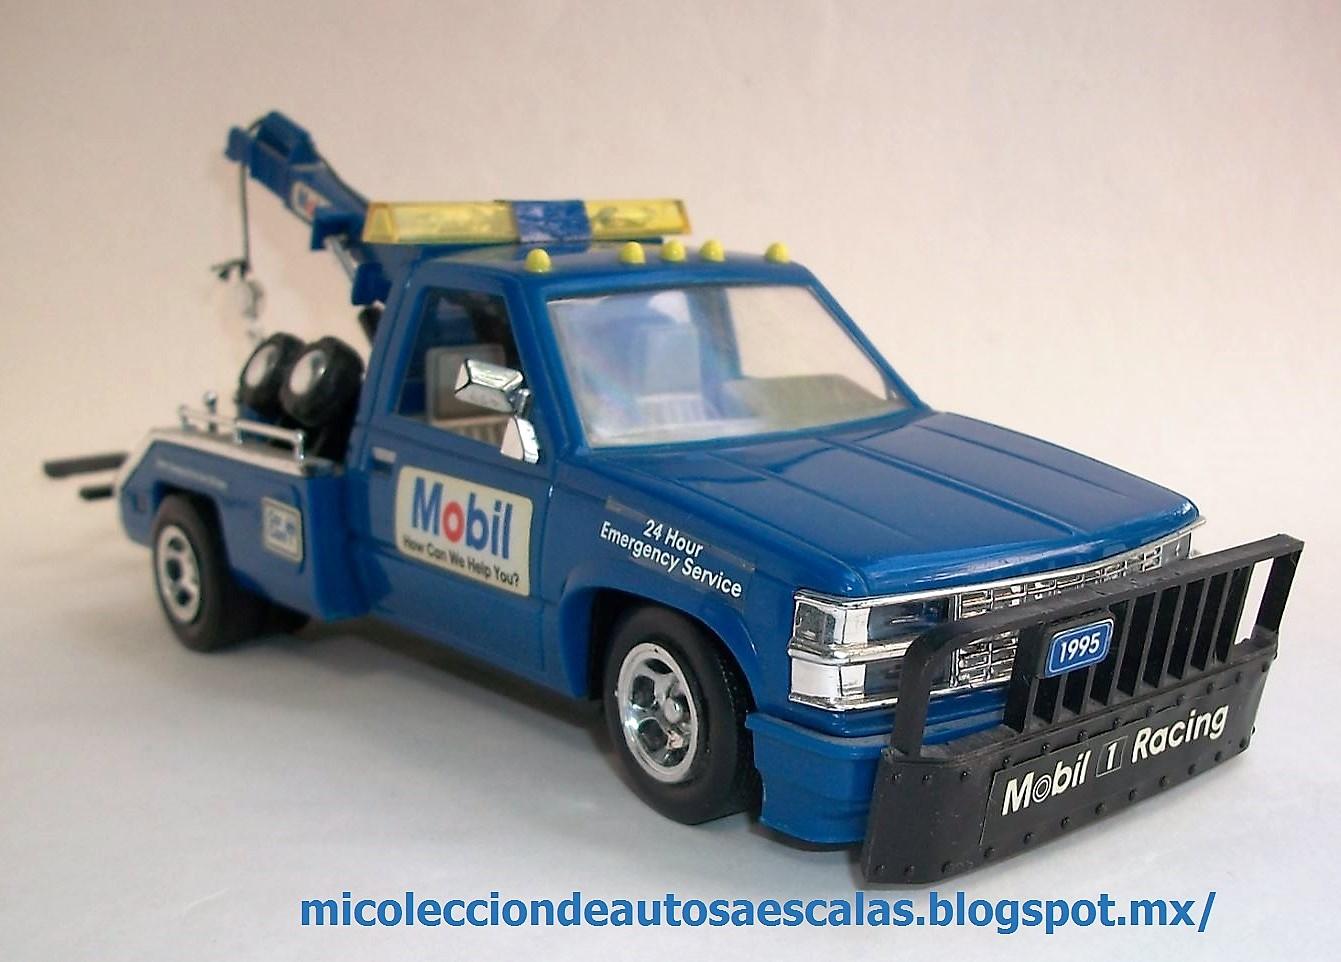 Mi Coleccin De Autos A Escala 1995 Chevrolet Tow Truck Mobil 1951 1953 Pickup Jada